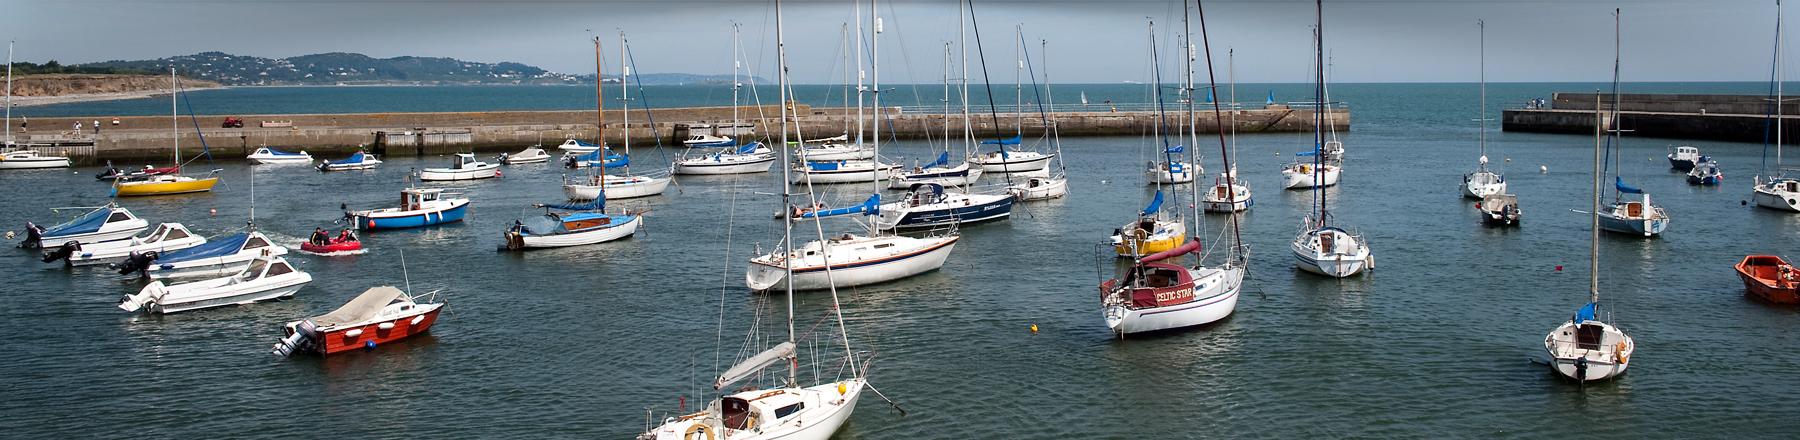 Aquabroker - Marine Insurance Specialists